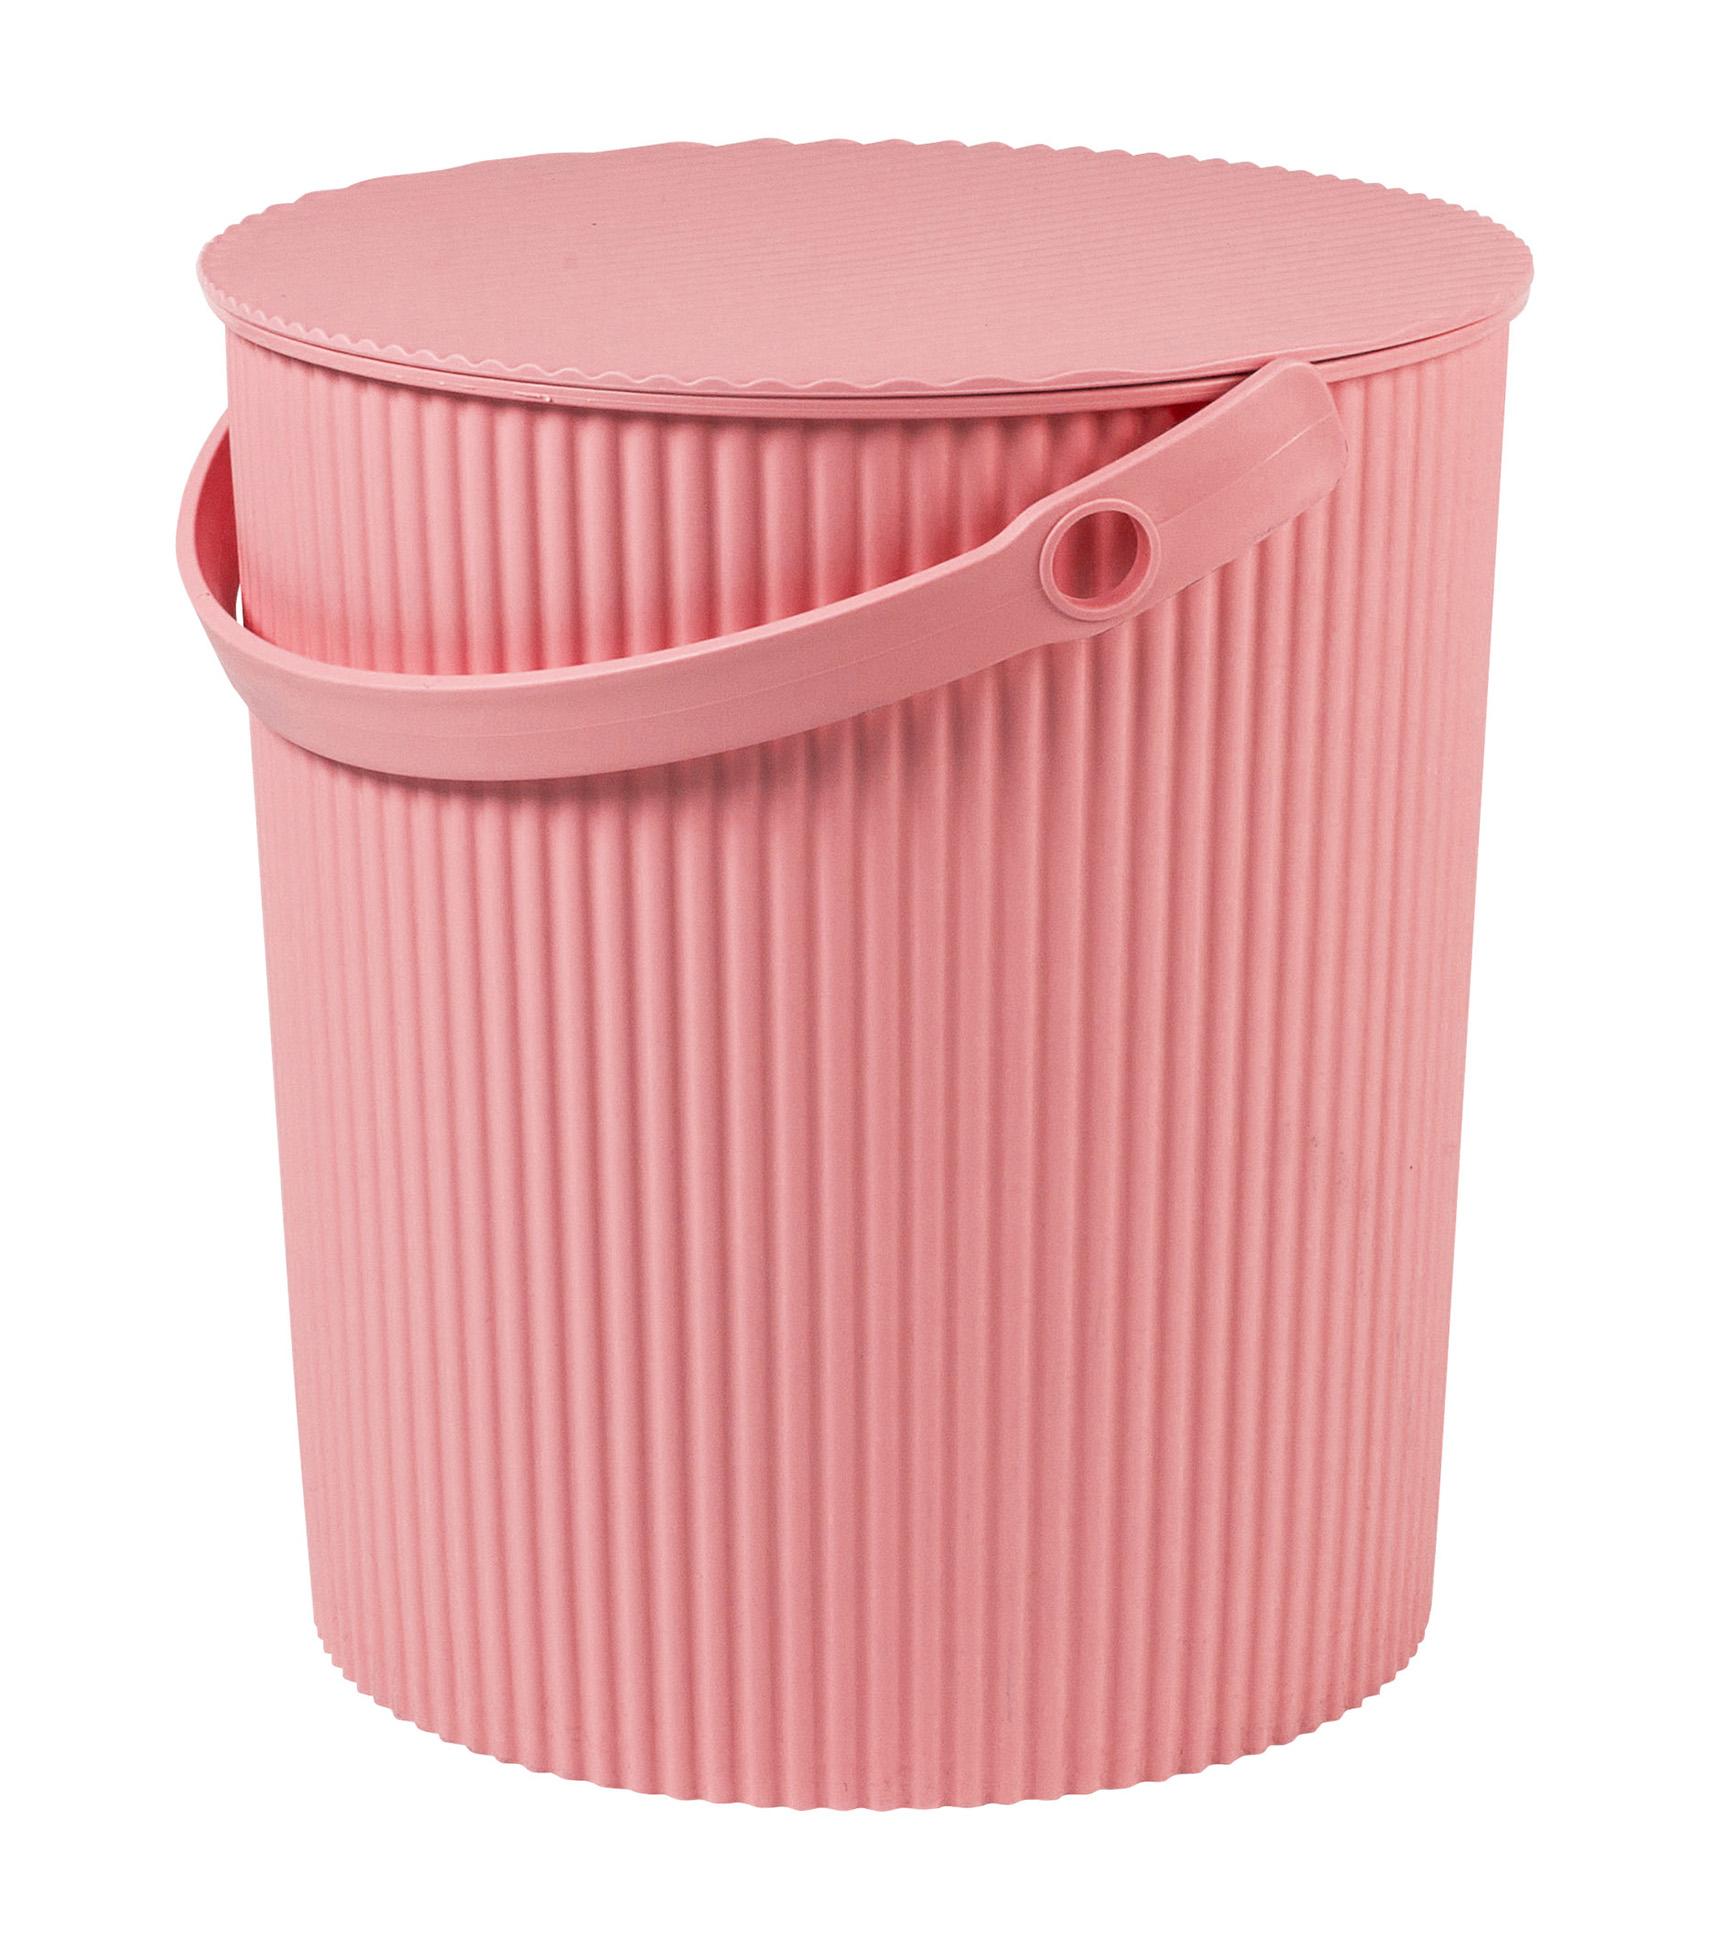 Úložný box/stupínek (30,8x33,1cm), růžová